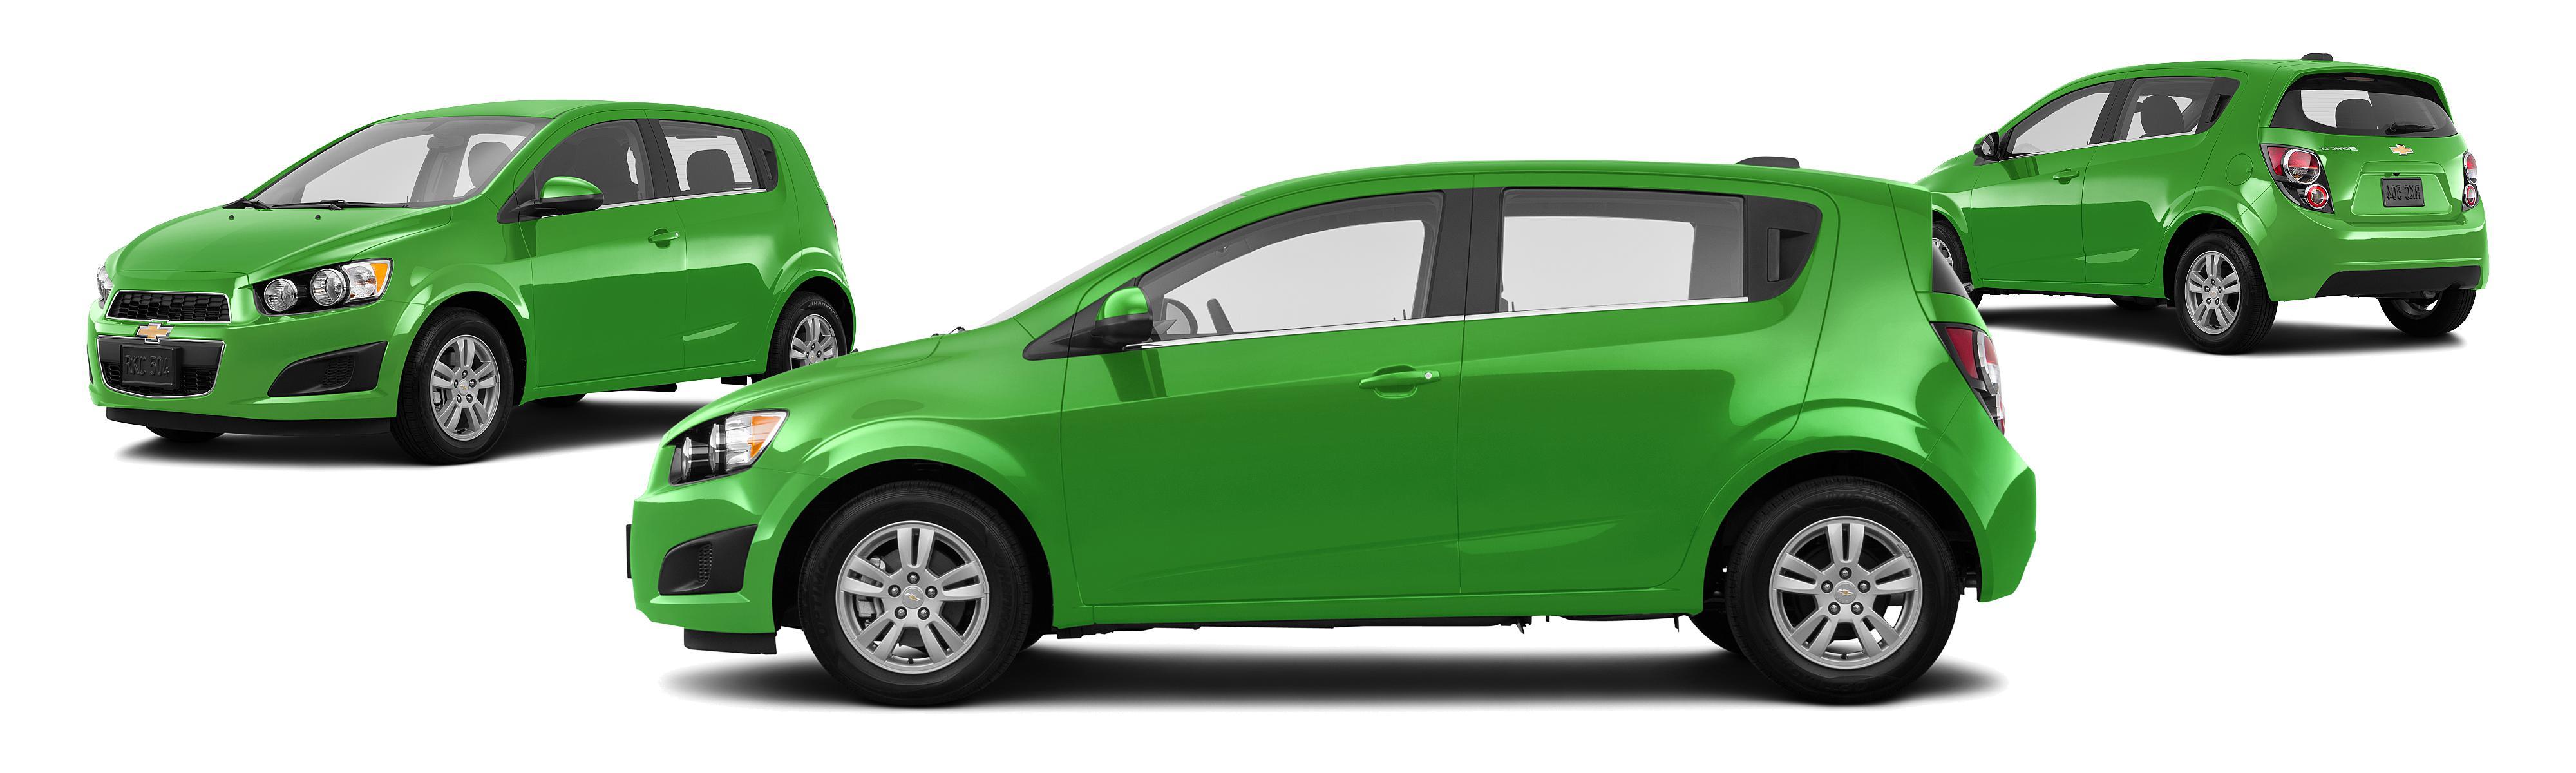 Chevrolet Sonic Repair Manual: Rear Compartment Lid Adjustment